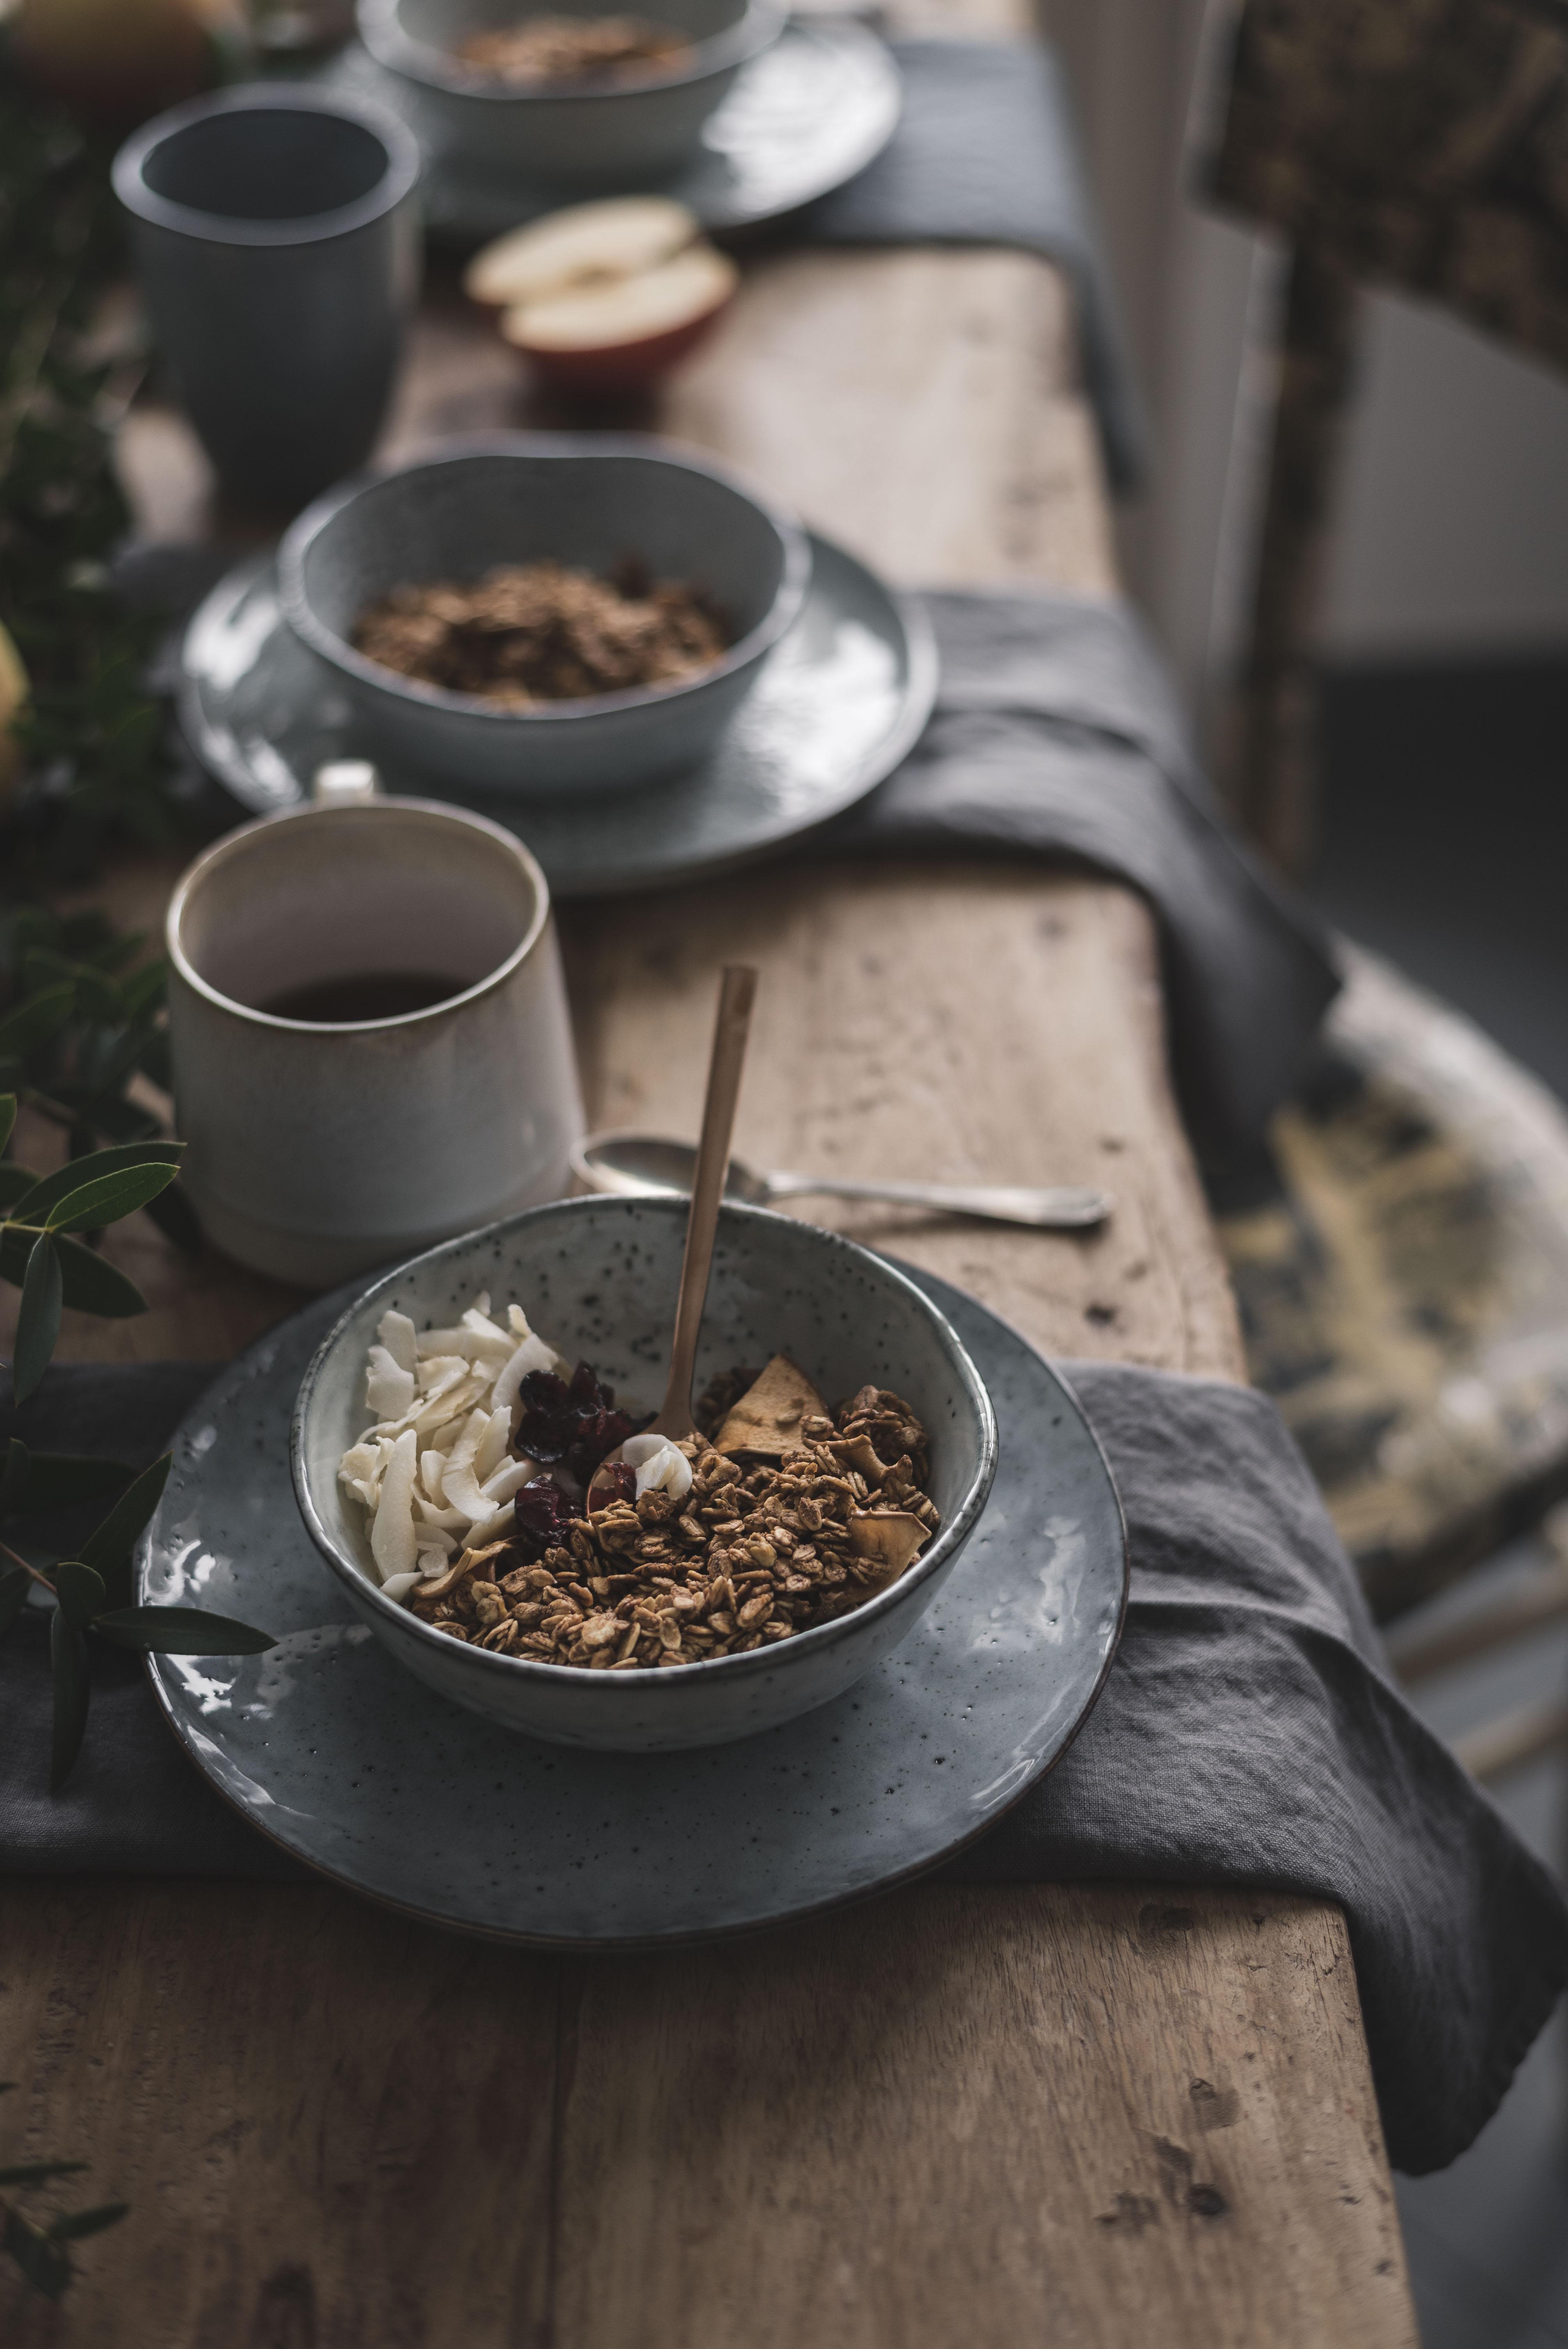 vegan apple granola recipe, no added sugar or fats